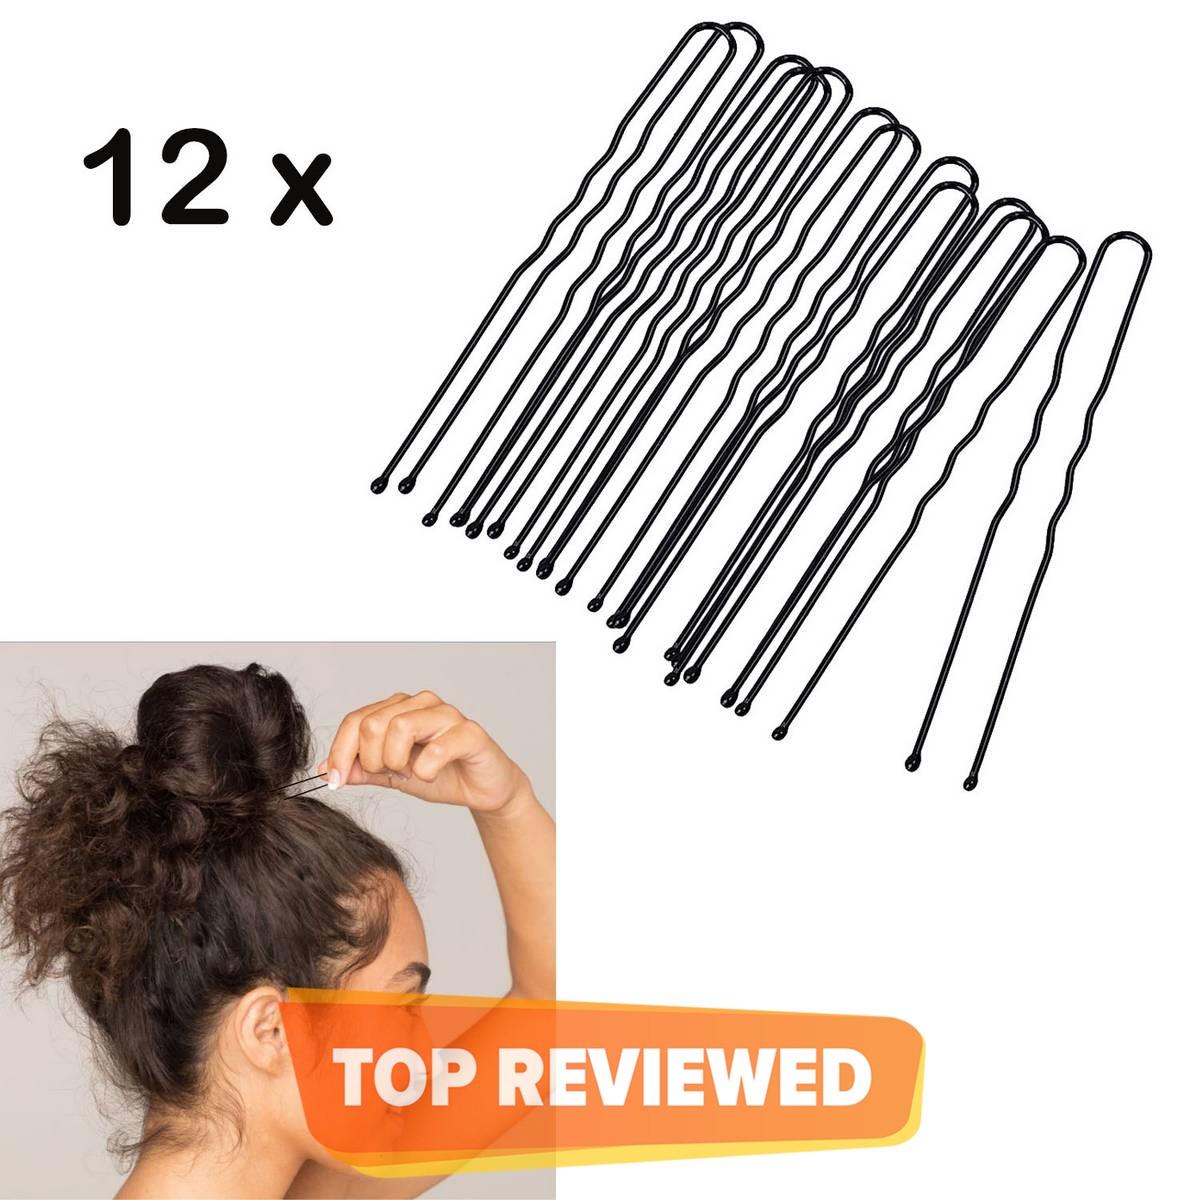 Large U Shape Pins Jura Pins, Bridal U Pins hair & Bun Pins for Kids/Girls/Women. (12 Pieces)